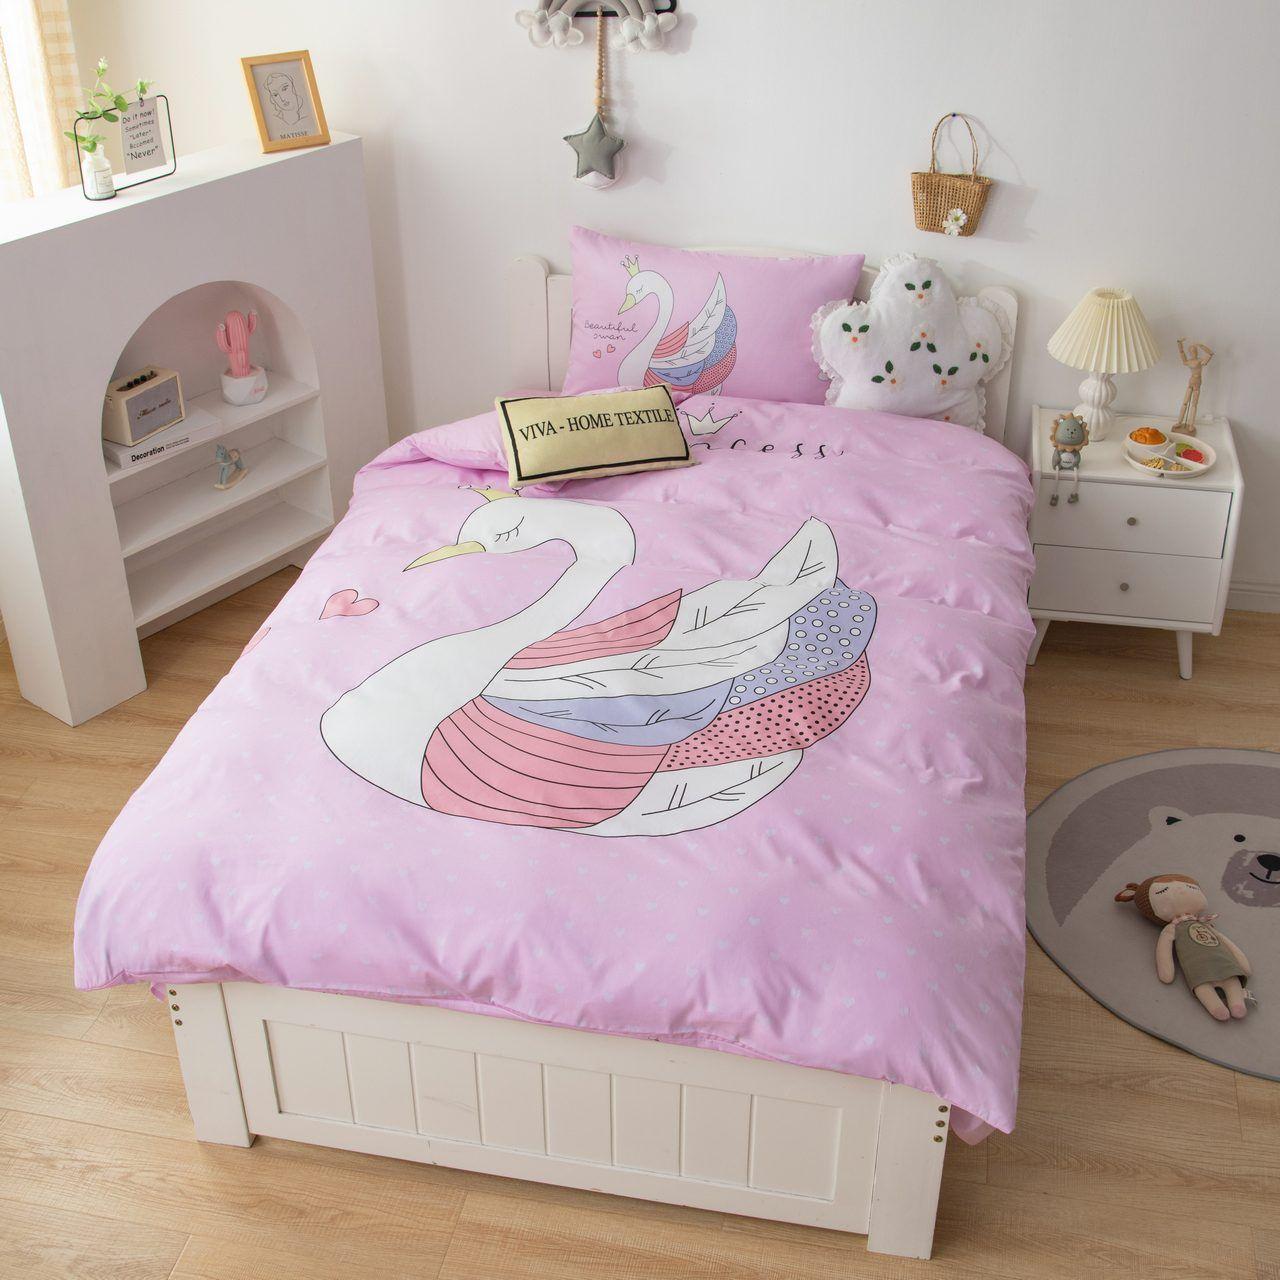 Sitrade / Sateen bedding set for children CD026, 1.5 sleeping pillowcase 50-70